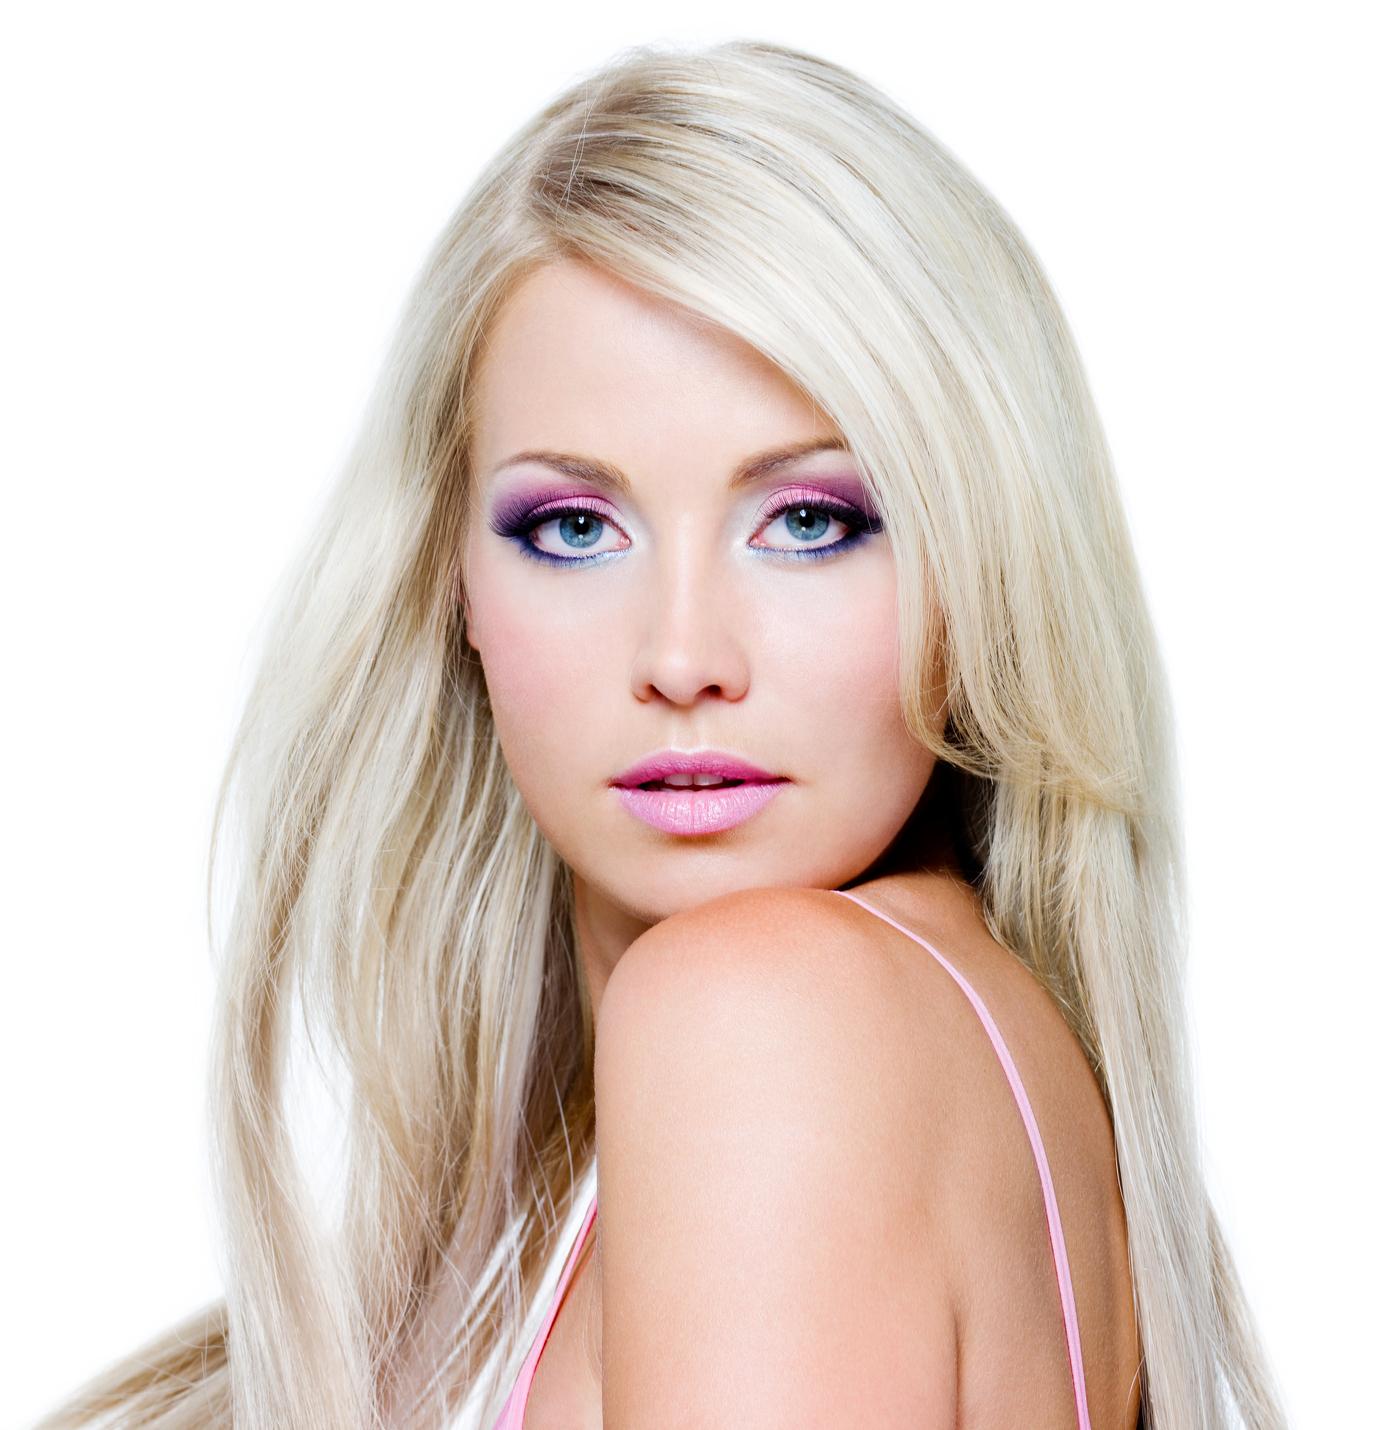 Blonde Hair women - MiLadies.net